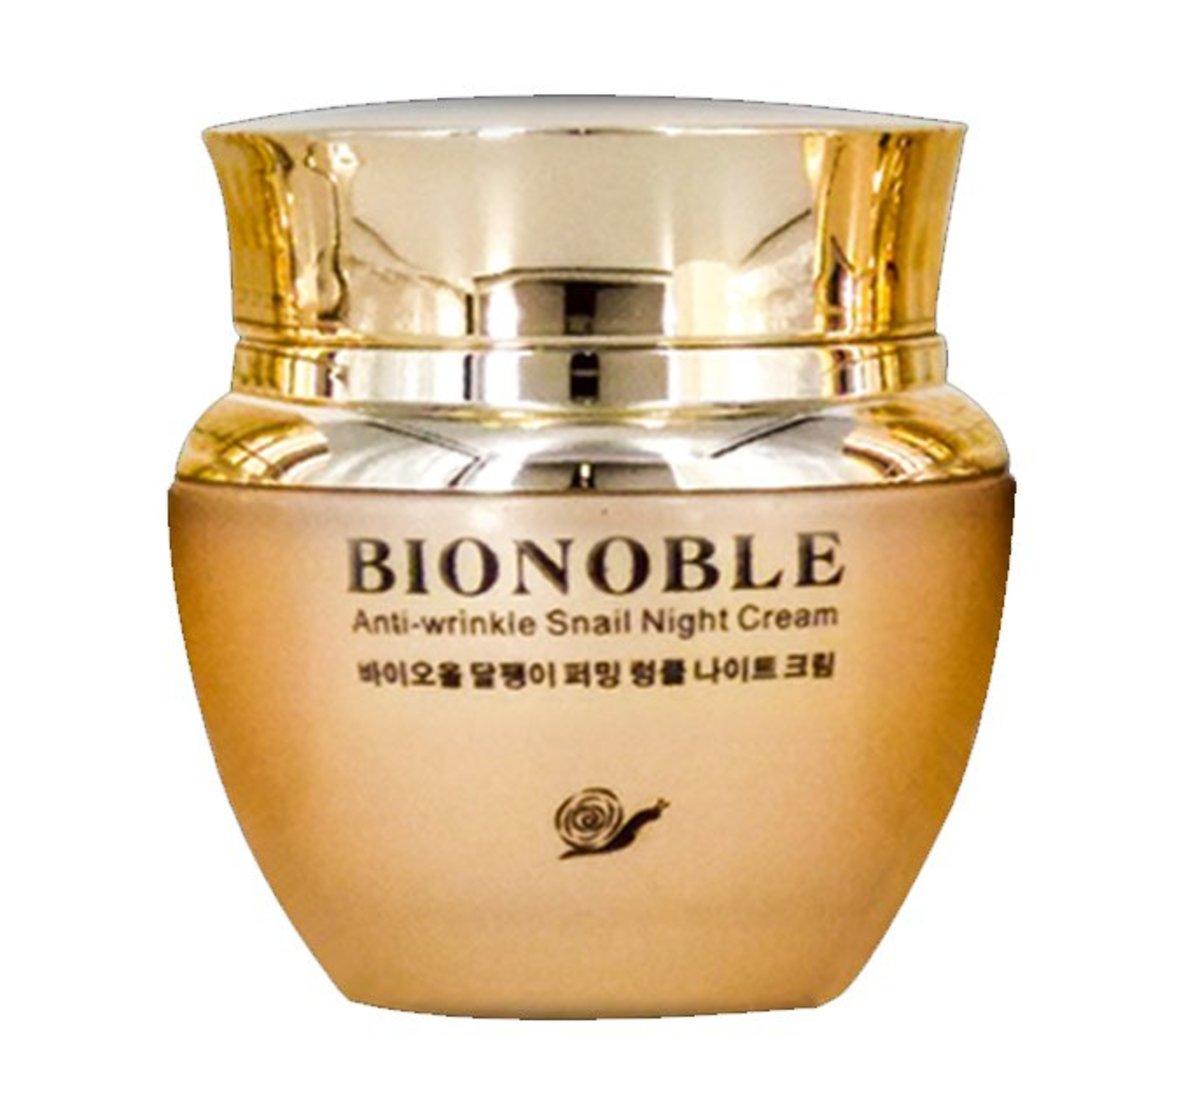 BIONOBLE Anti-wrinkle Snail Night Cream 50g